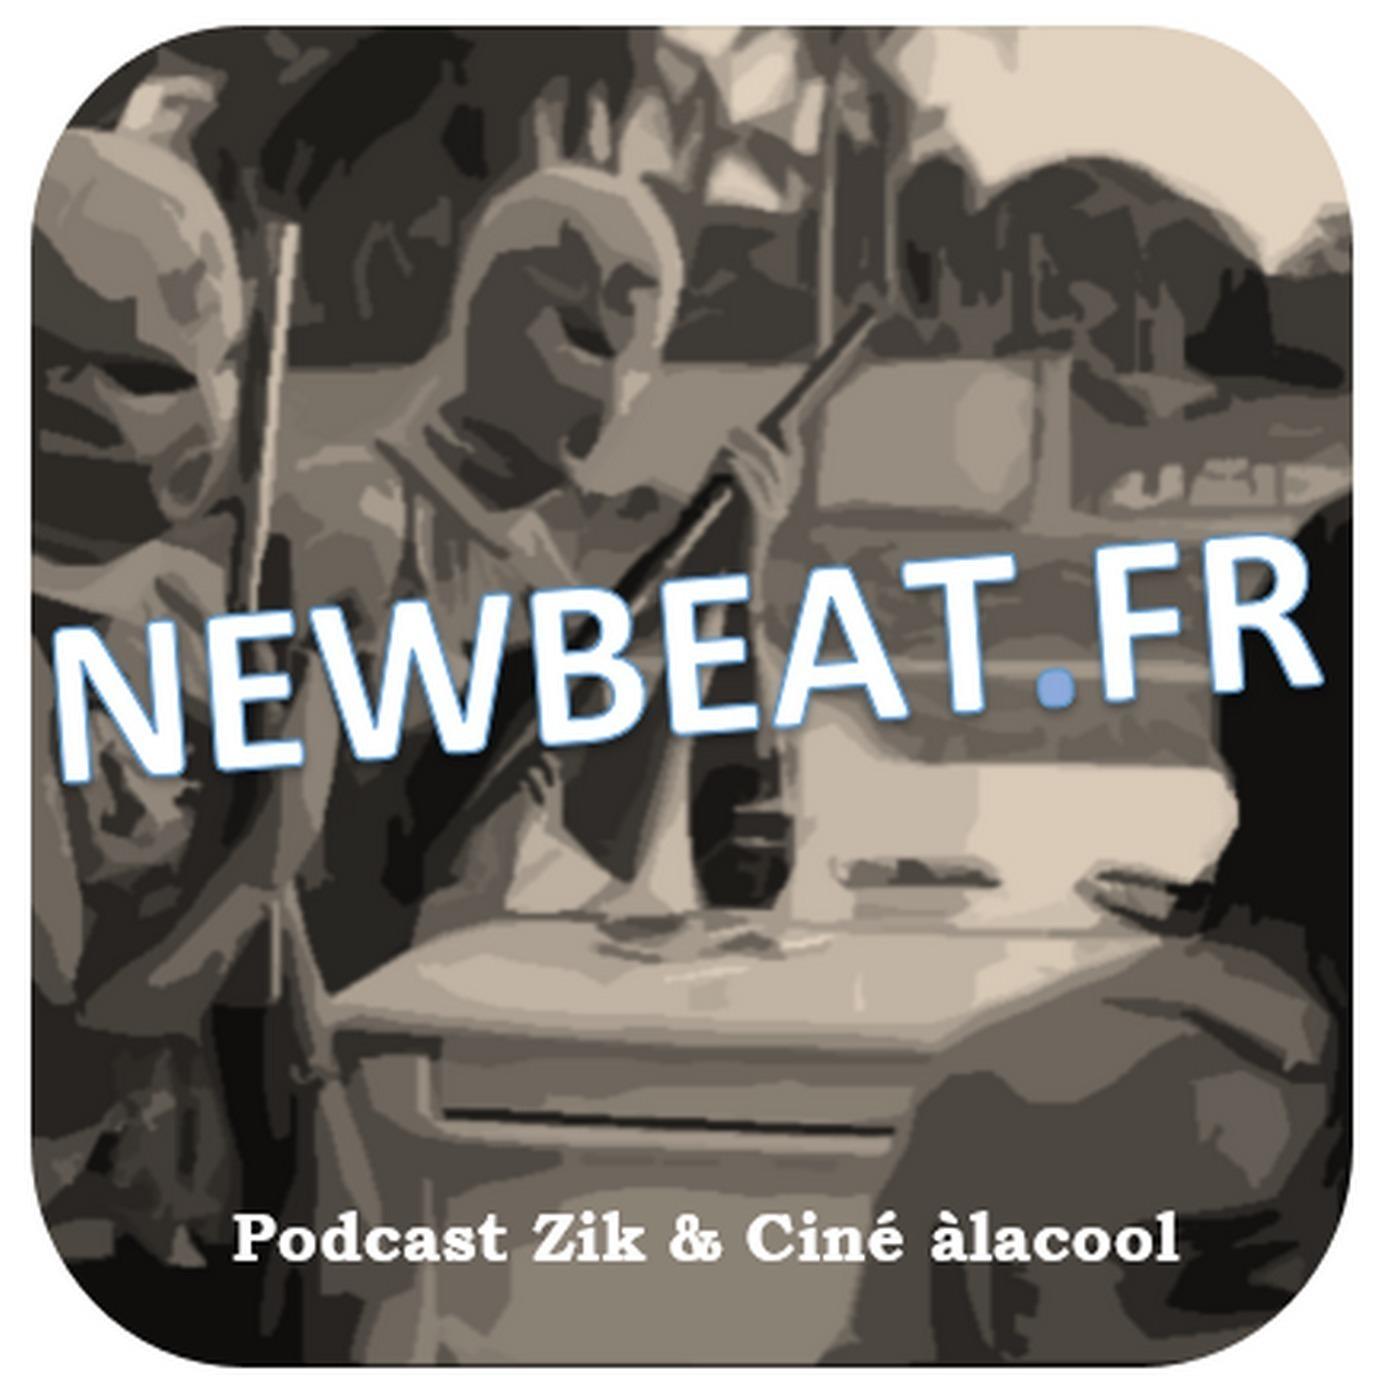 Episode 13 - Basket Case - Newbeat.fr...